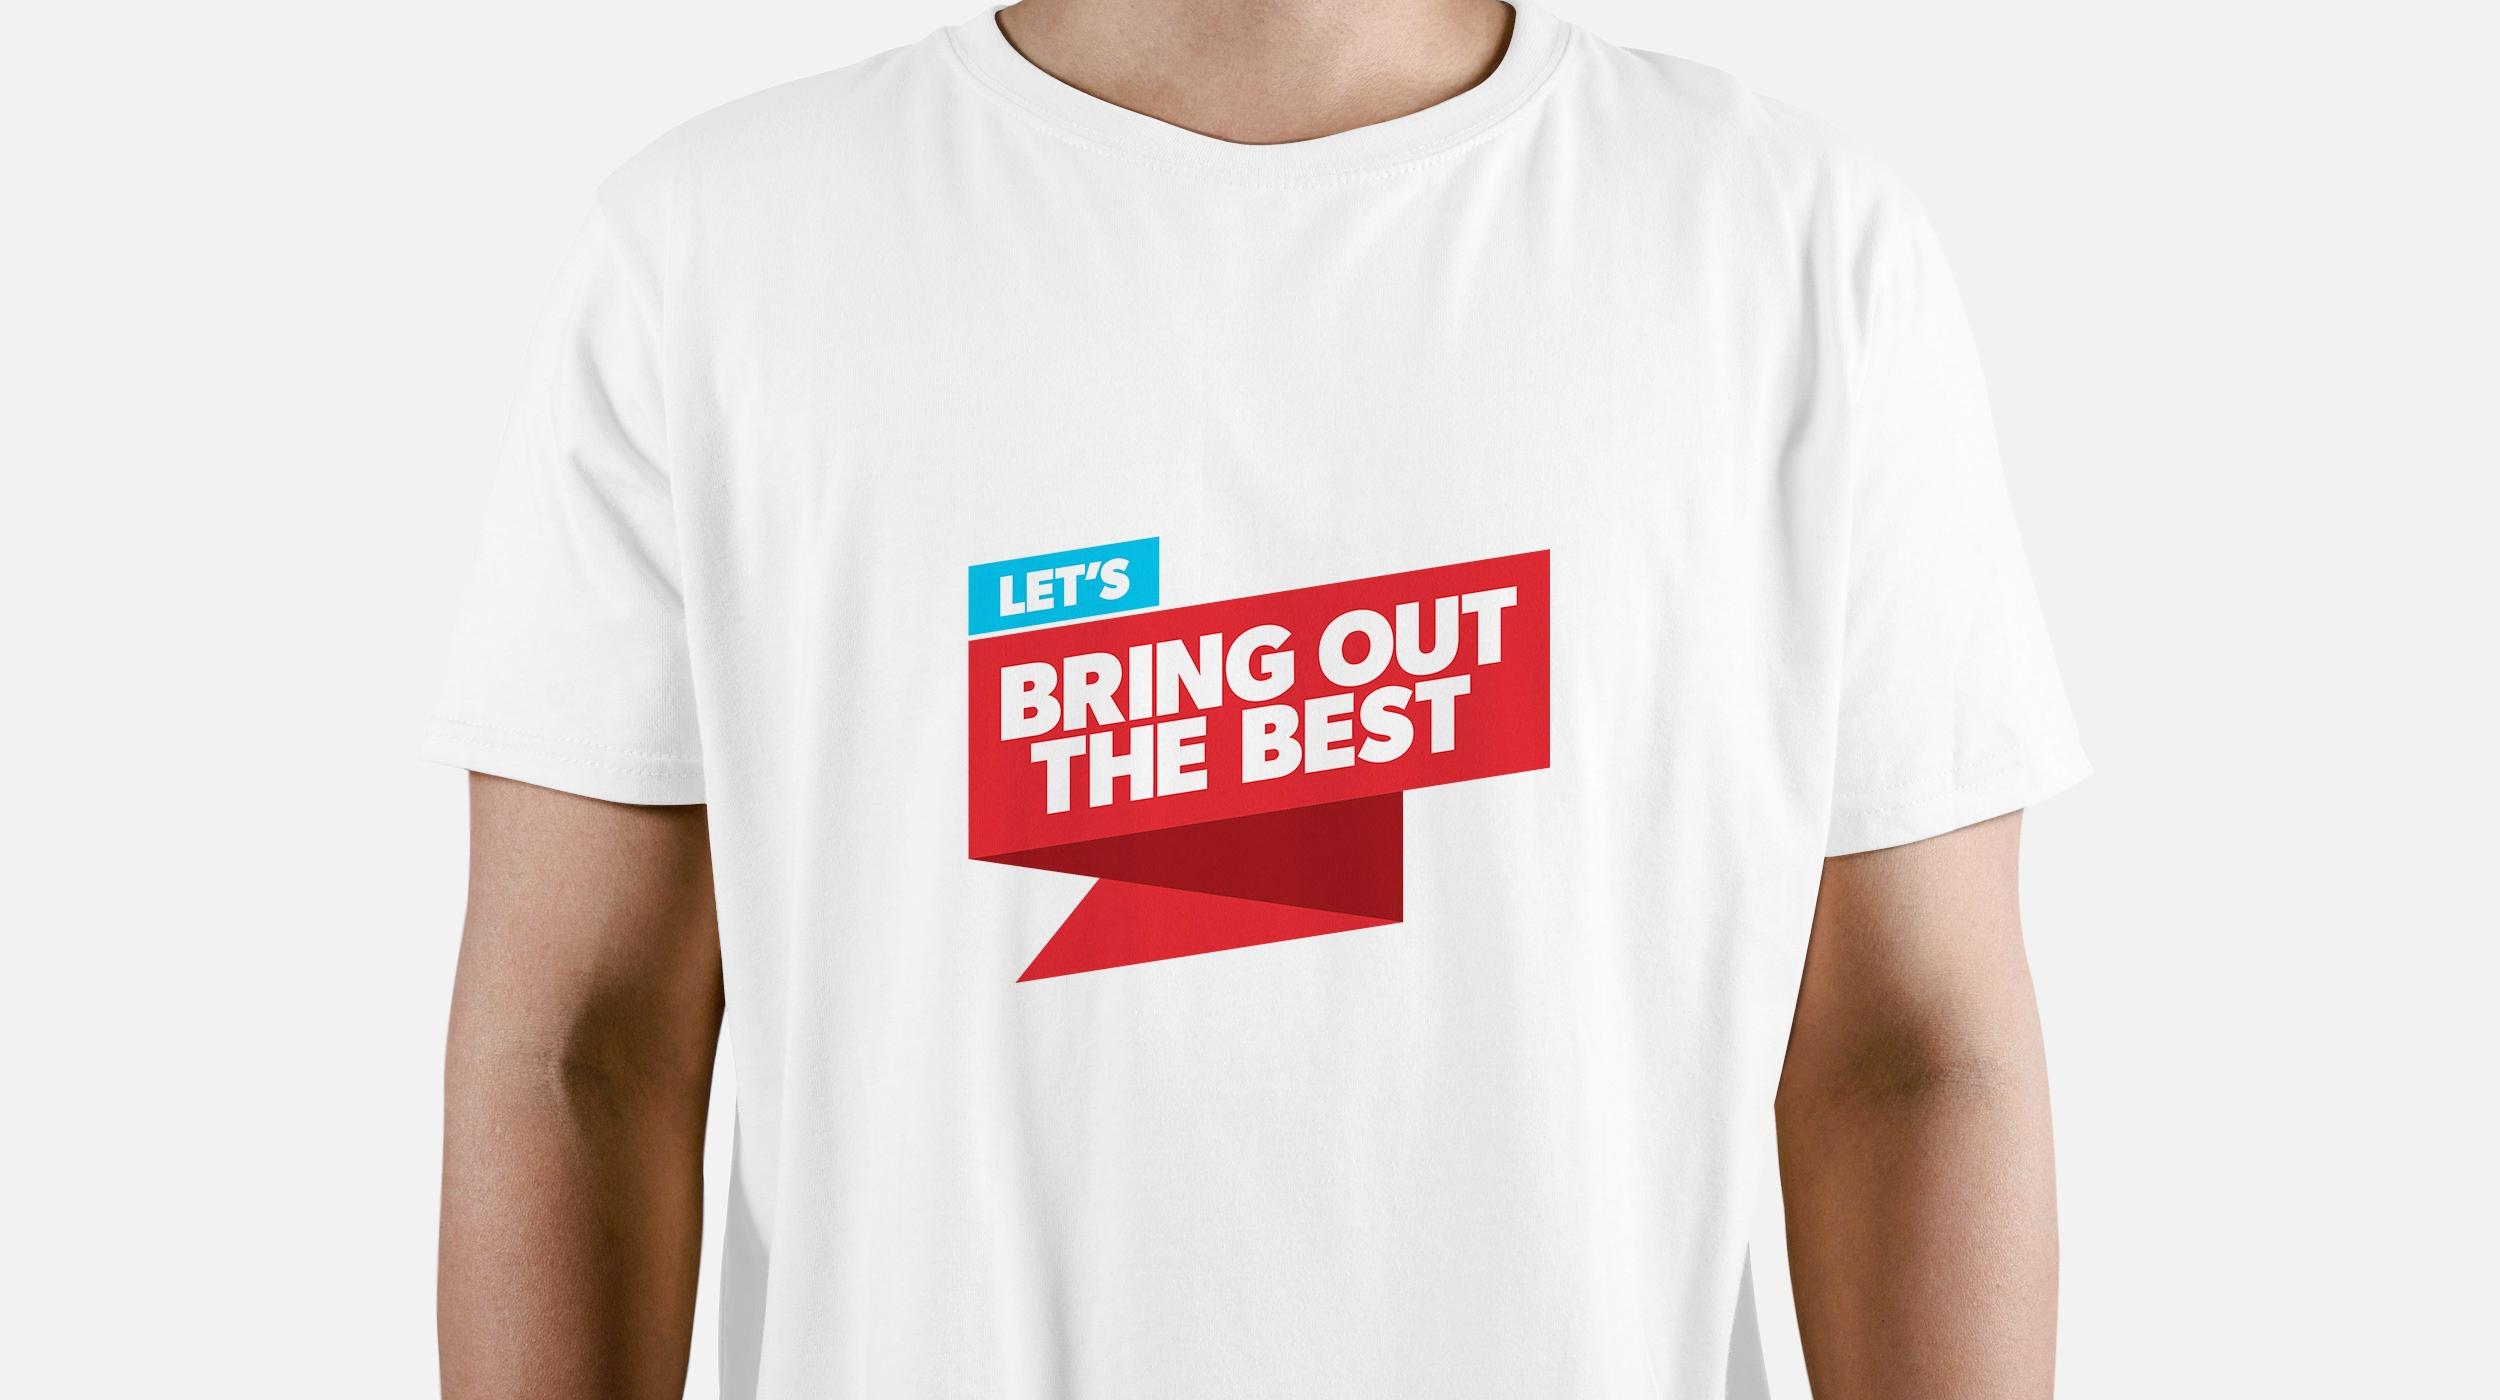 PPTA-Collective-Agreement-Case-Study_2018-T-Shirt.jpg